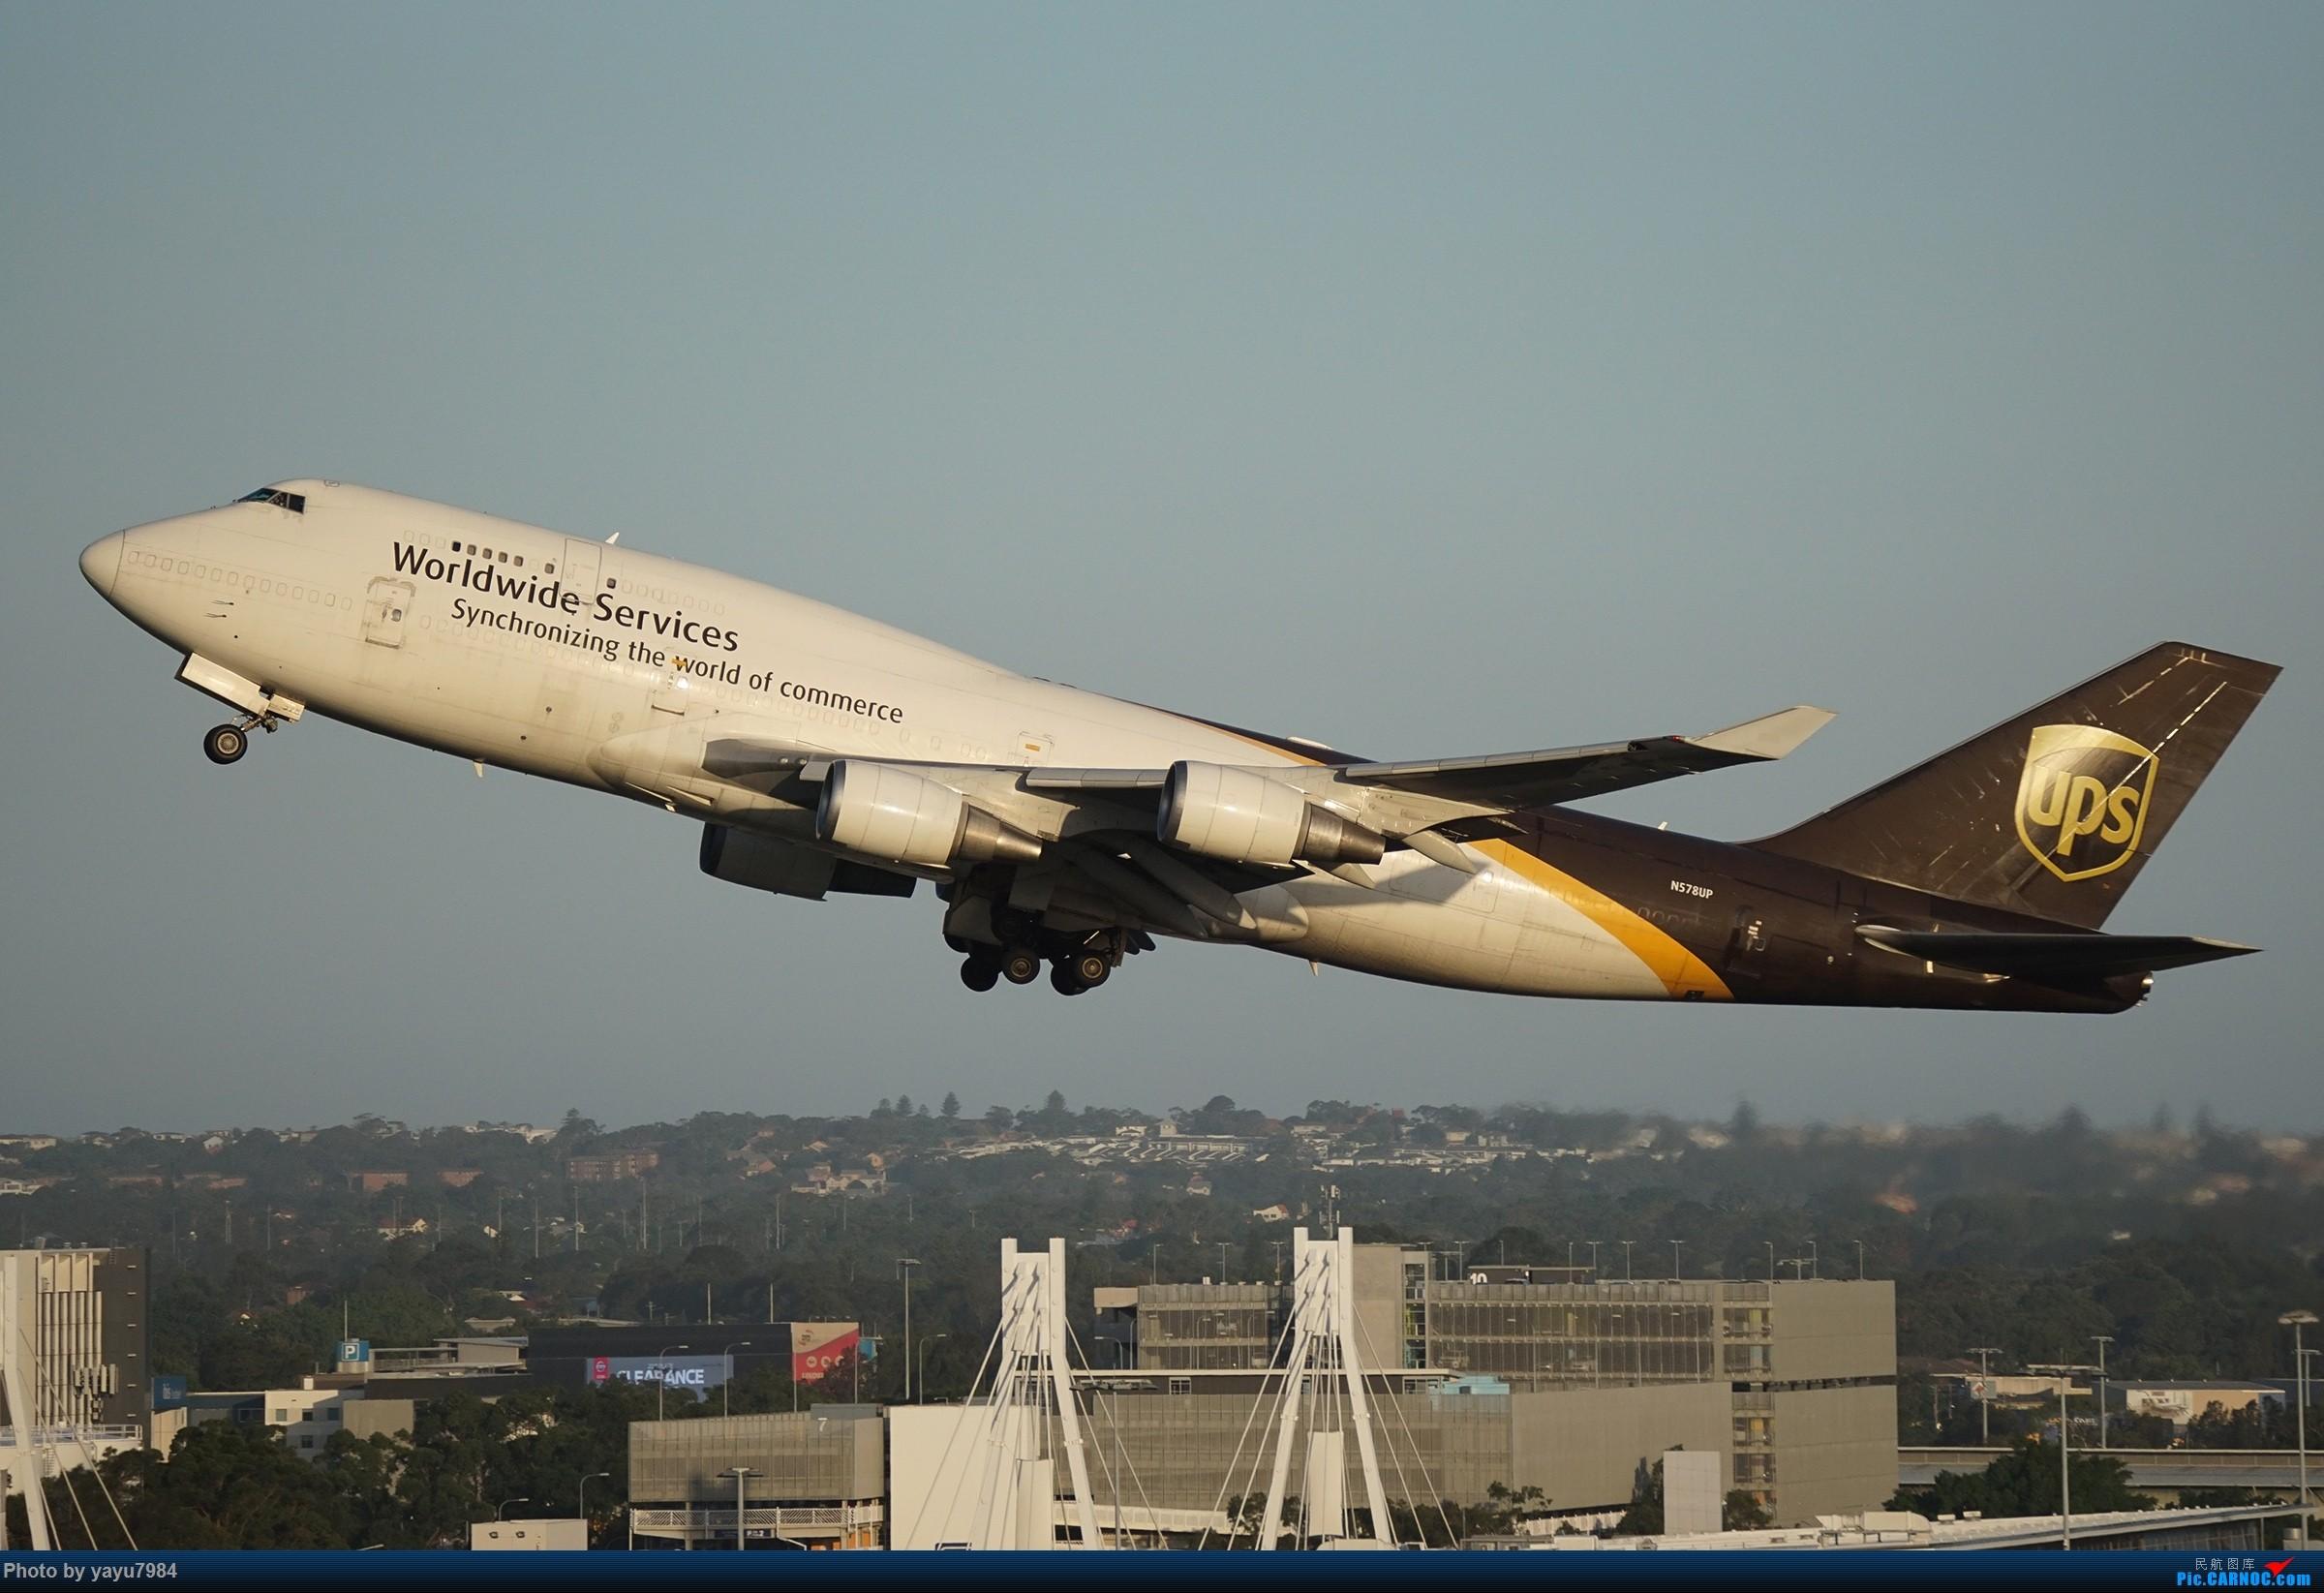 Re:[原创][SYD] 2019首拍,停车楼视角 BOEING 747-45E(BCF) N578UP 澳大利亚悉尼金斯福德·史密斯机场